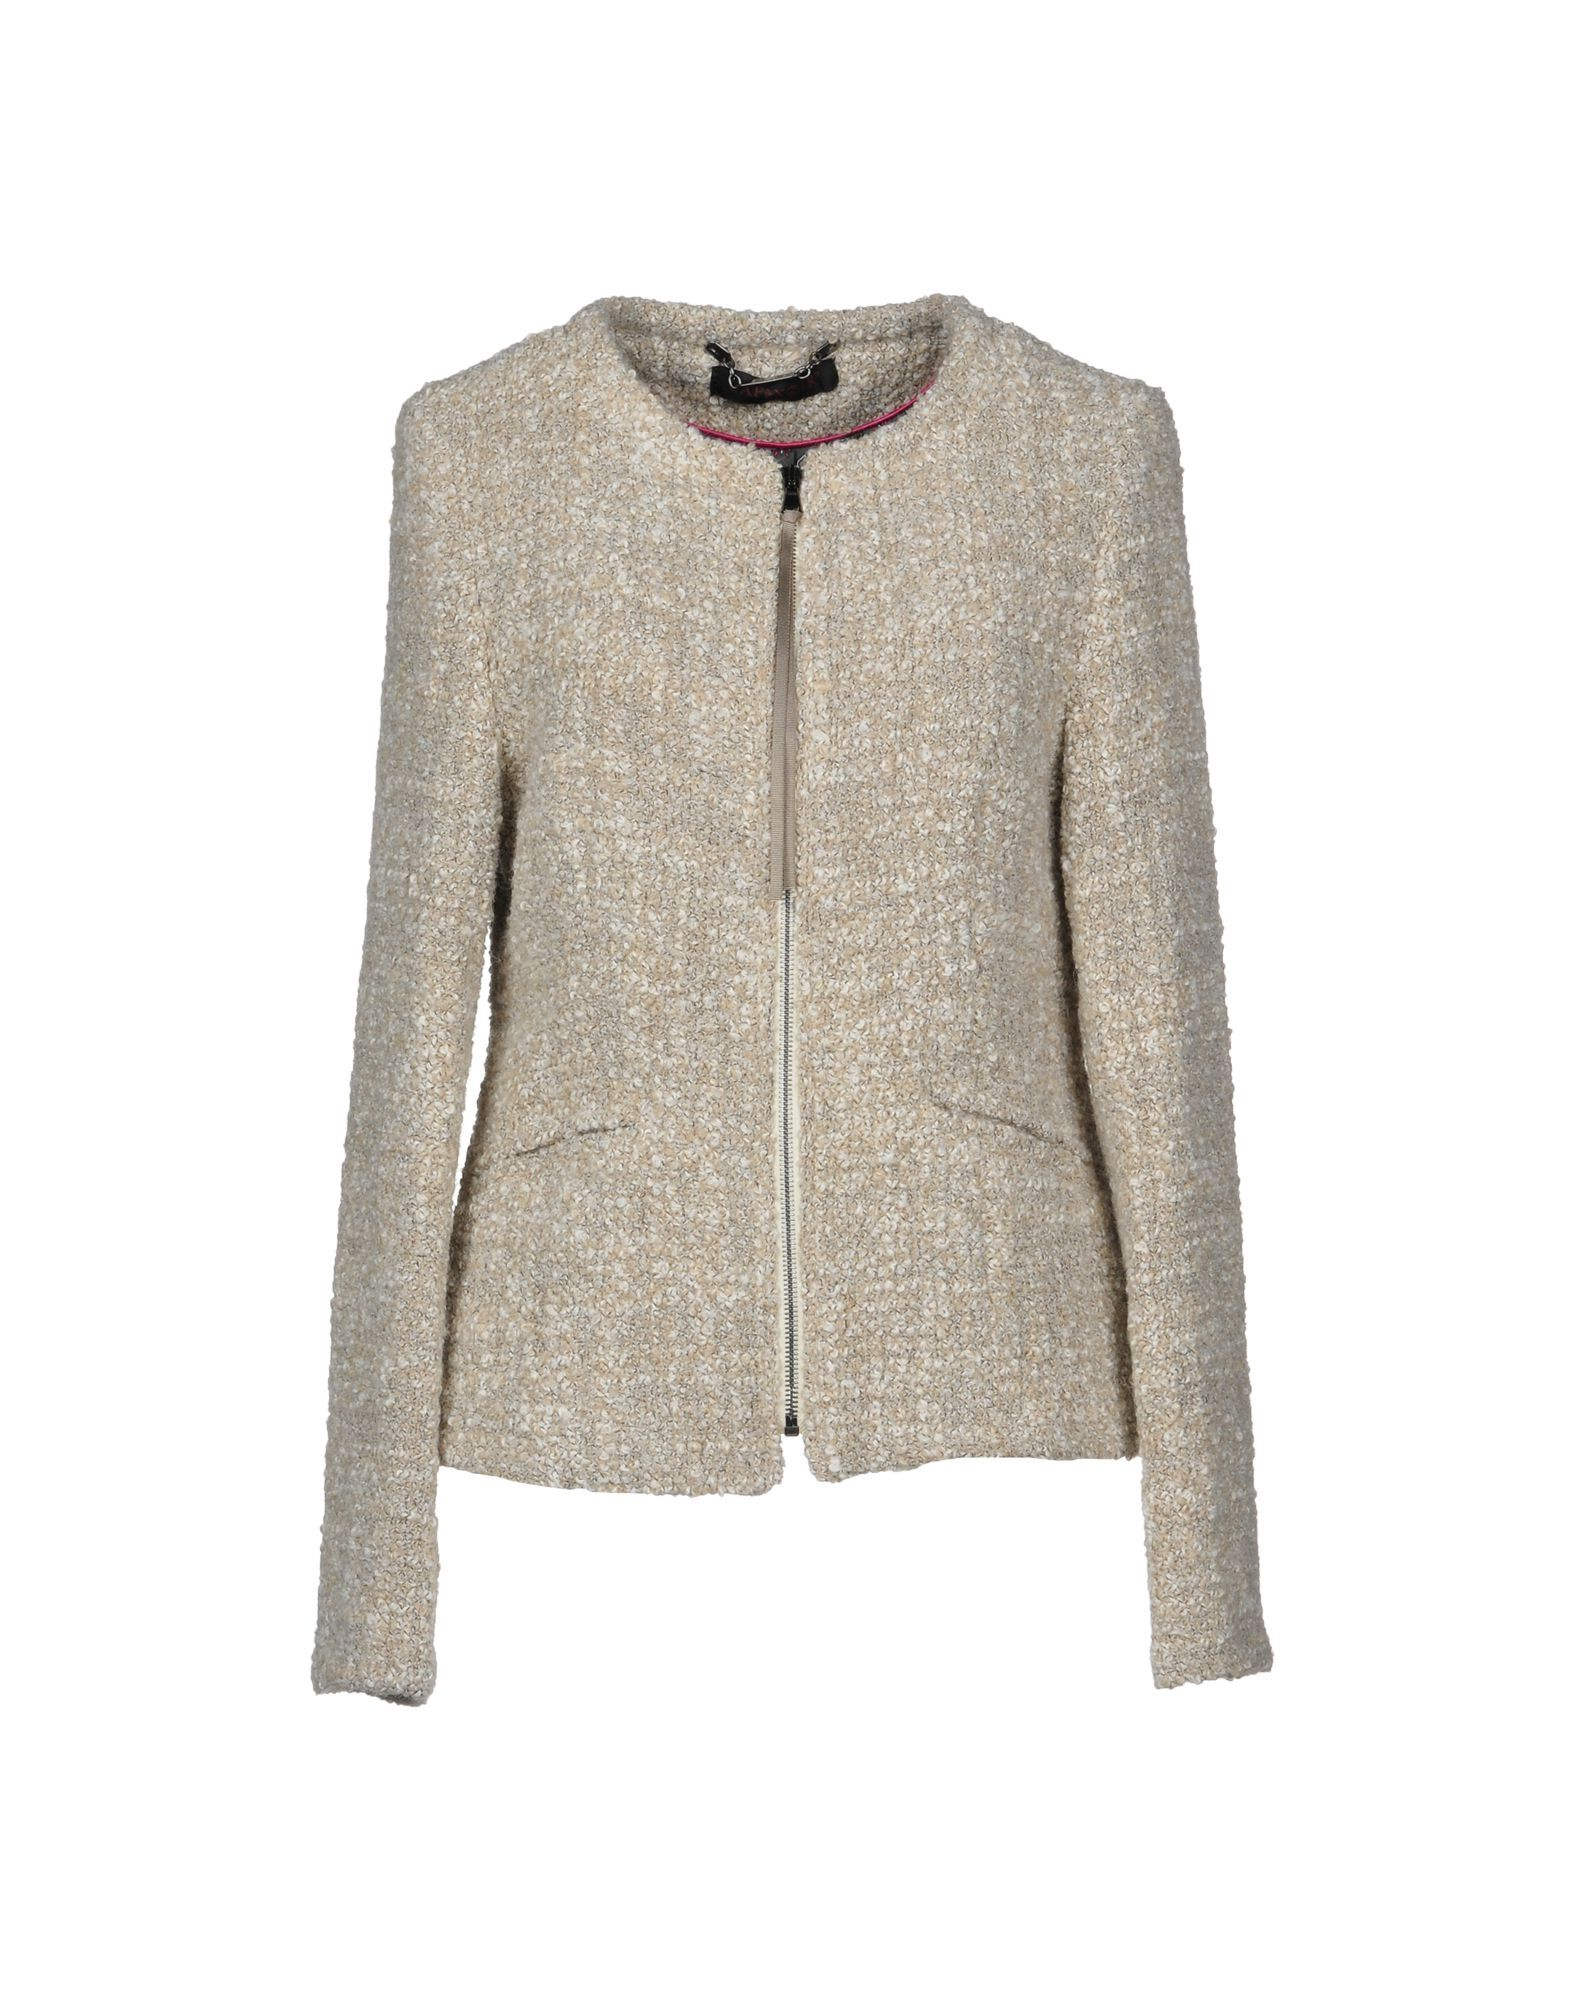 Cafenoir Beige Boucle Jacket